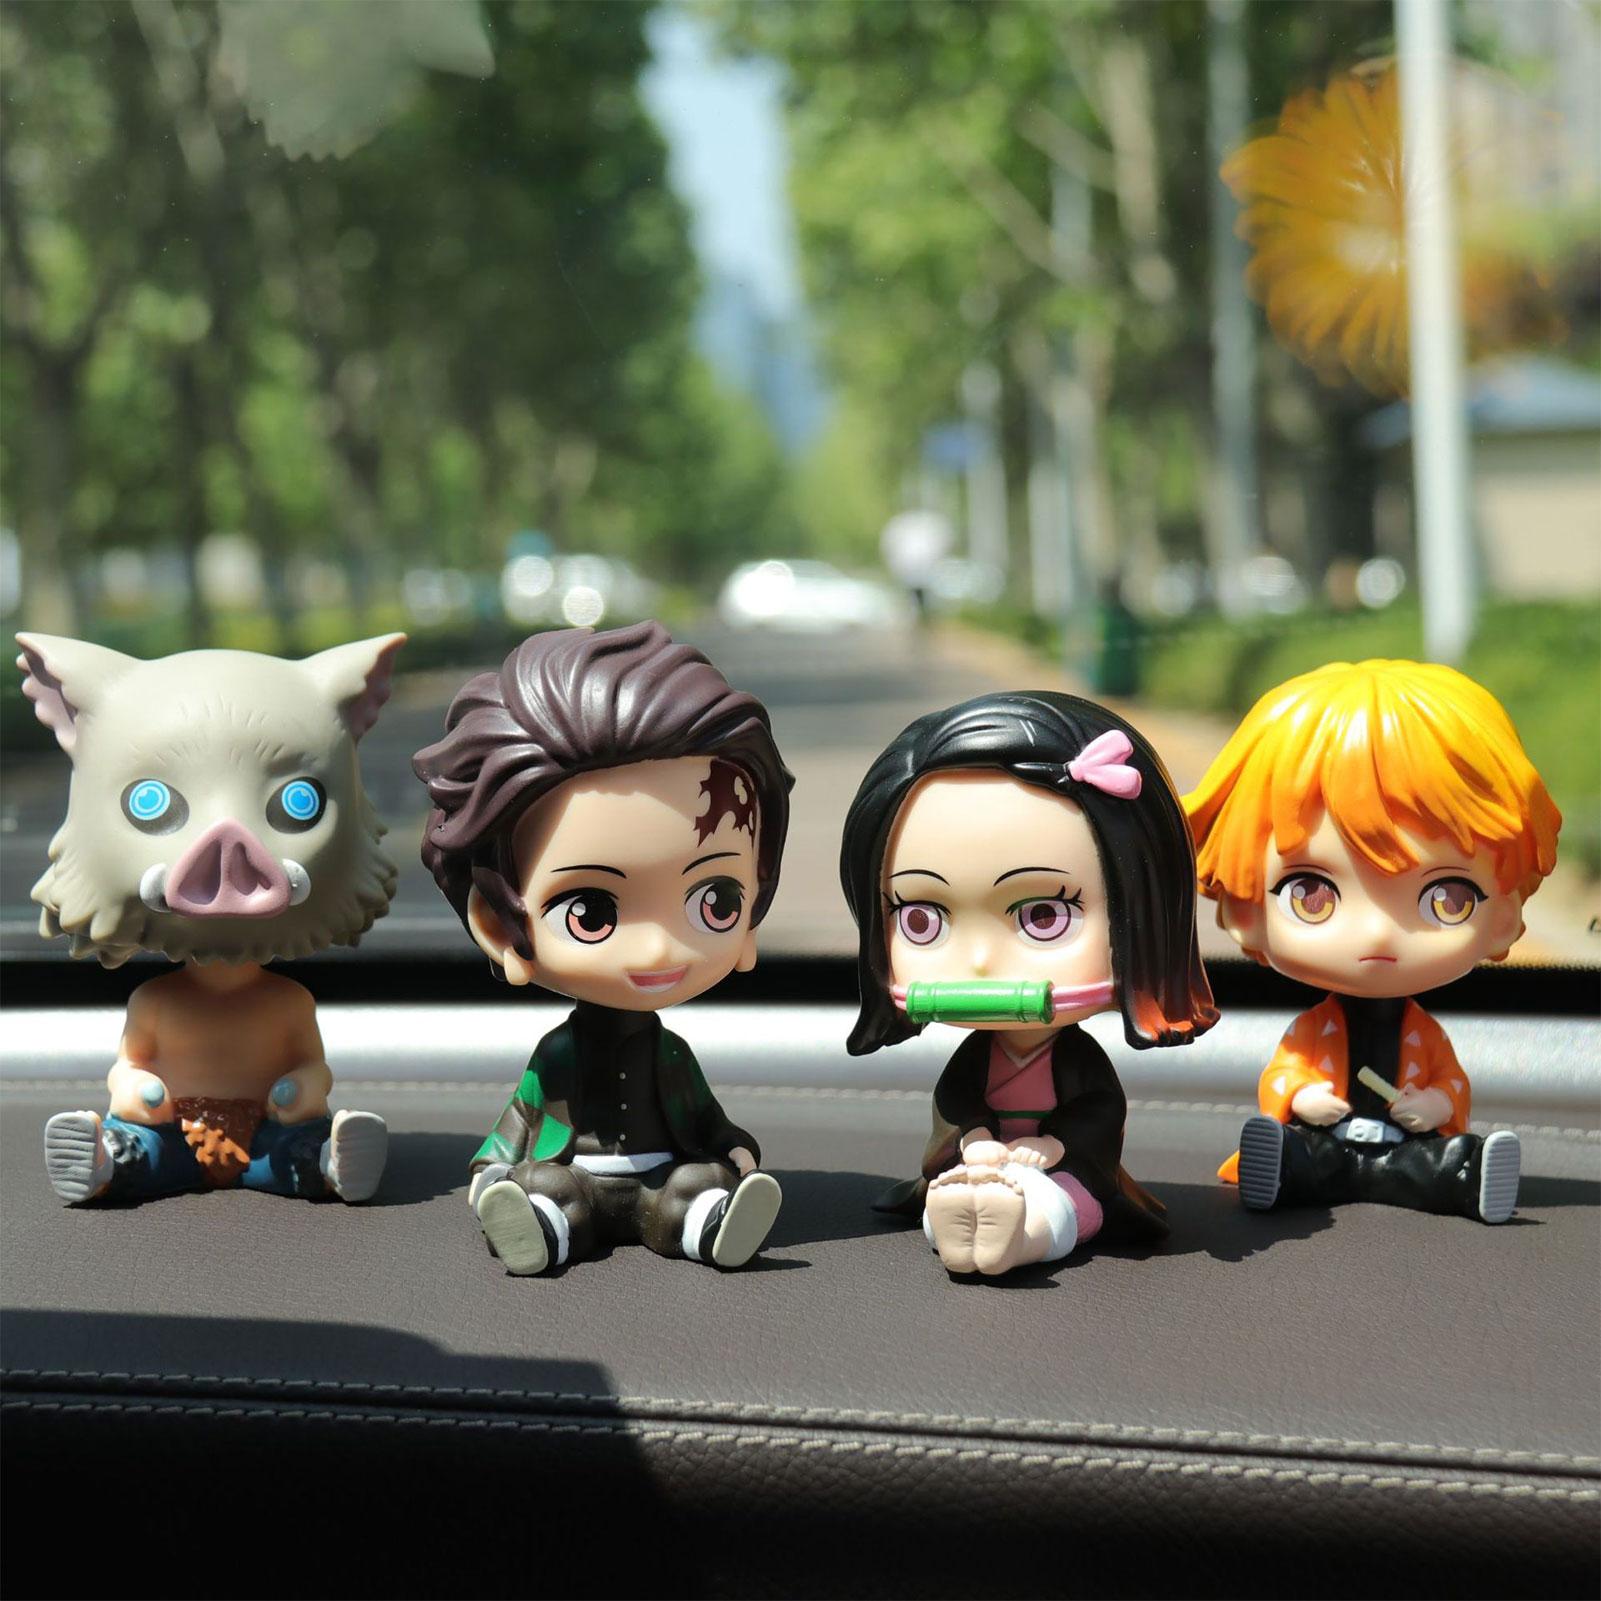 Modelo de Personaje de Anime para decoración de coche, figura innovadora, adorno para salpicadero de coche, modelo de Personaje de Anime, juguete para niños, regalo